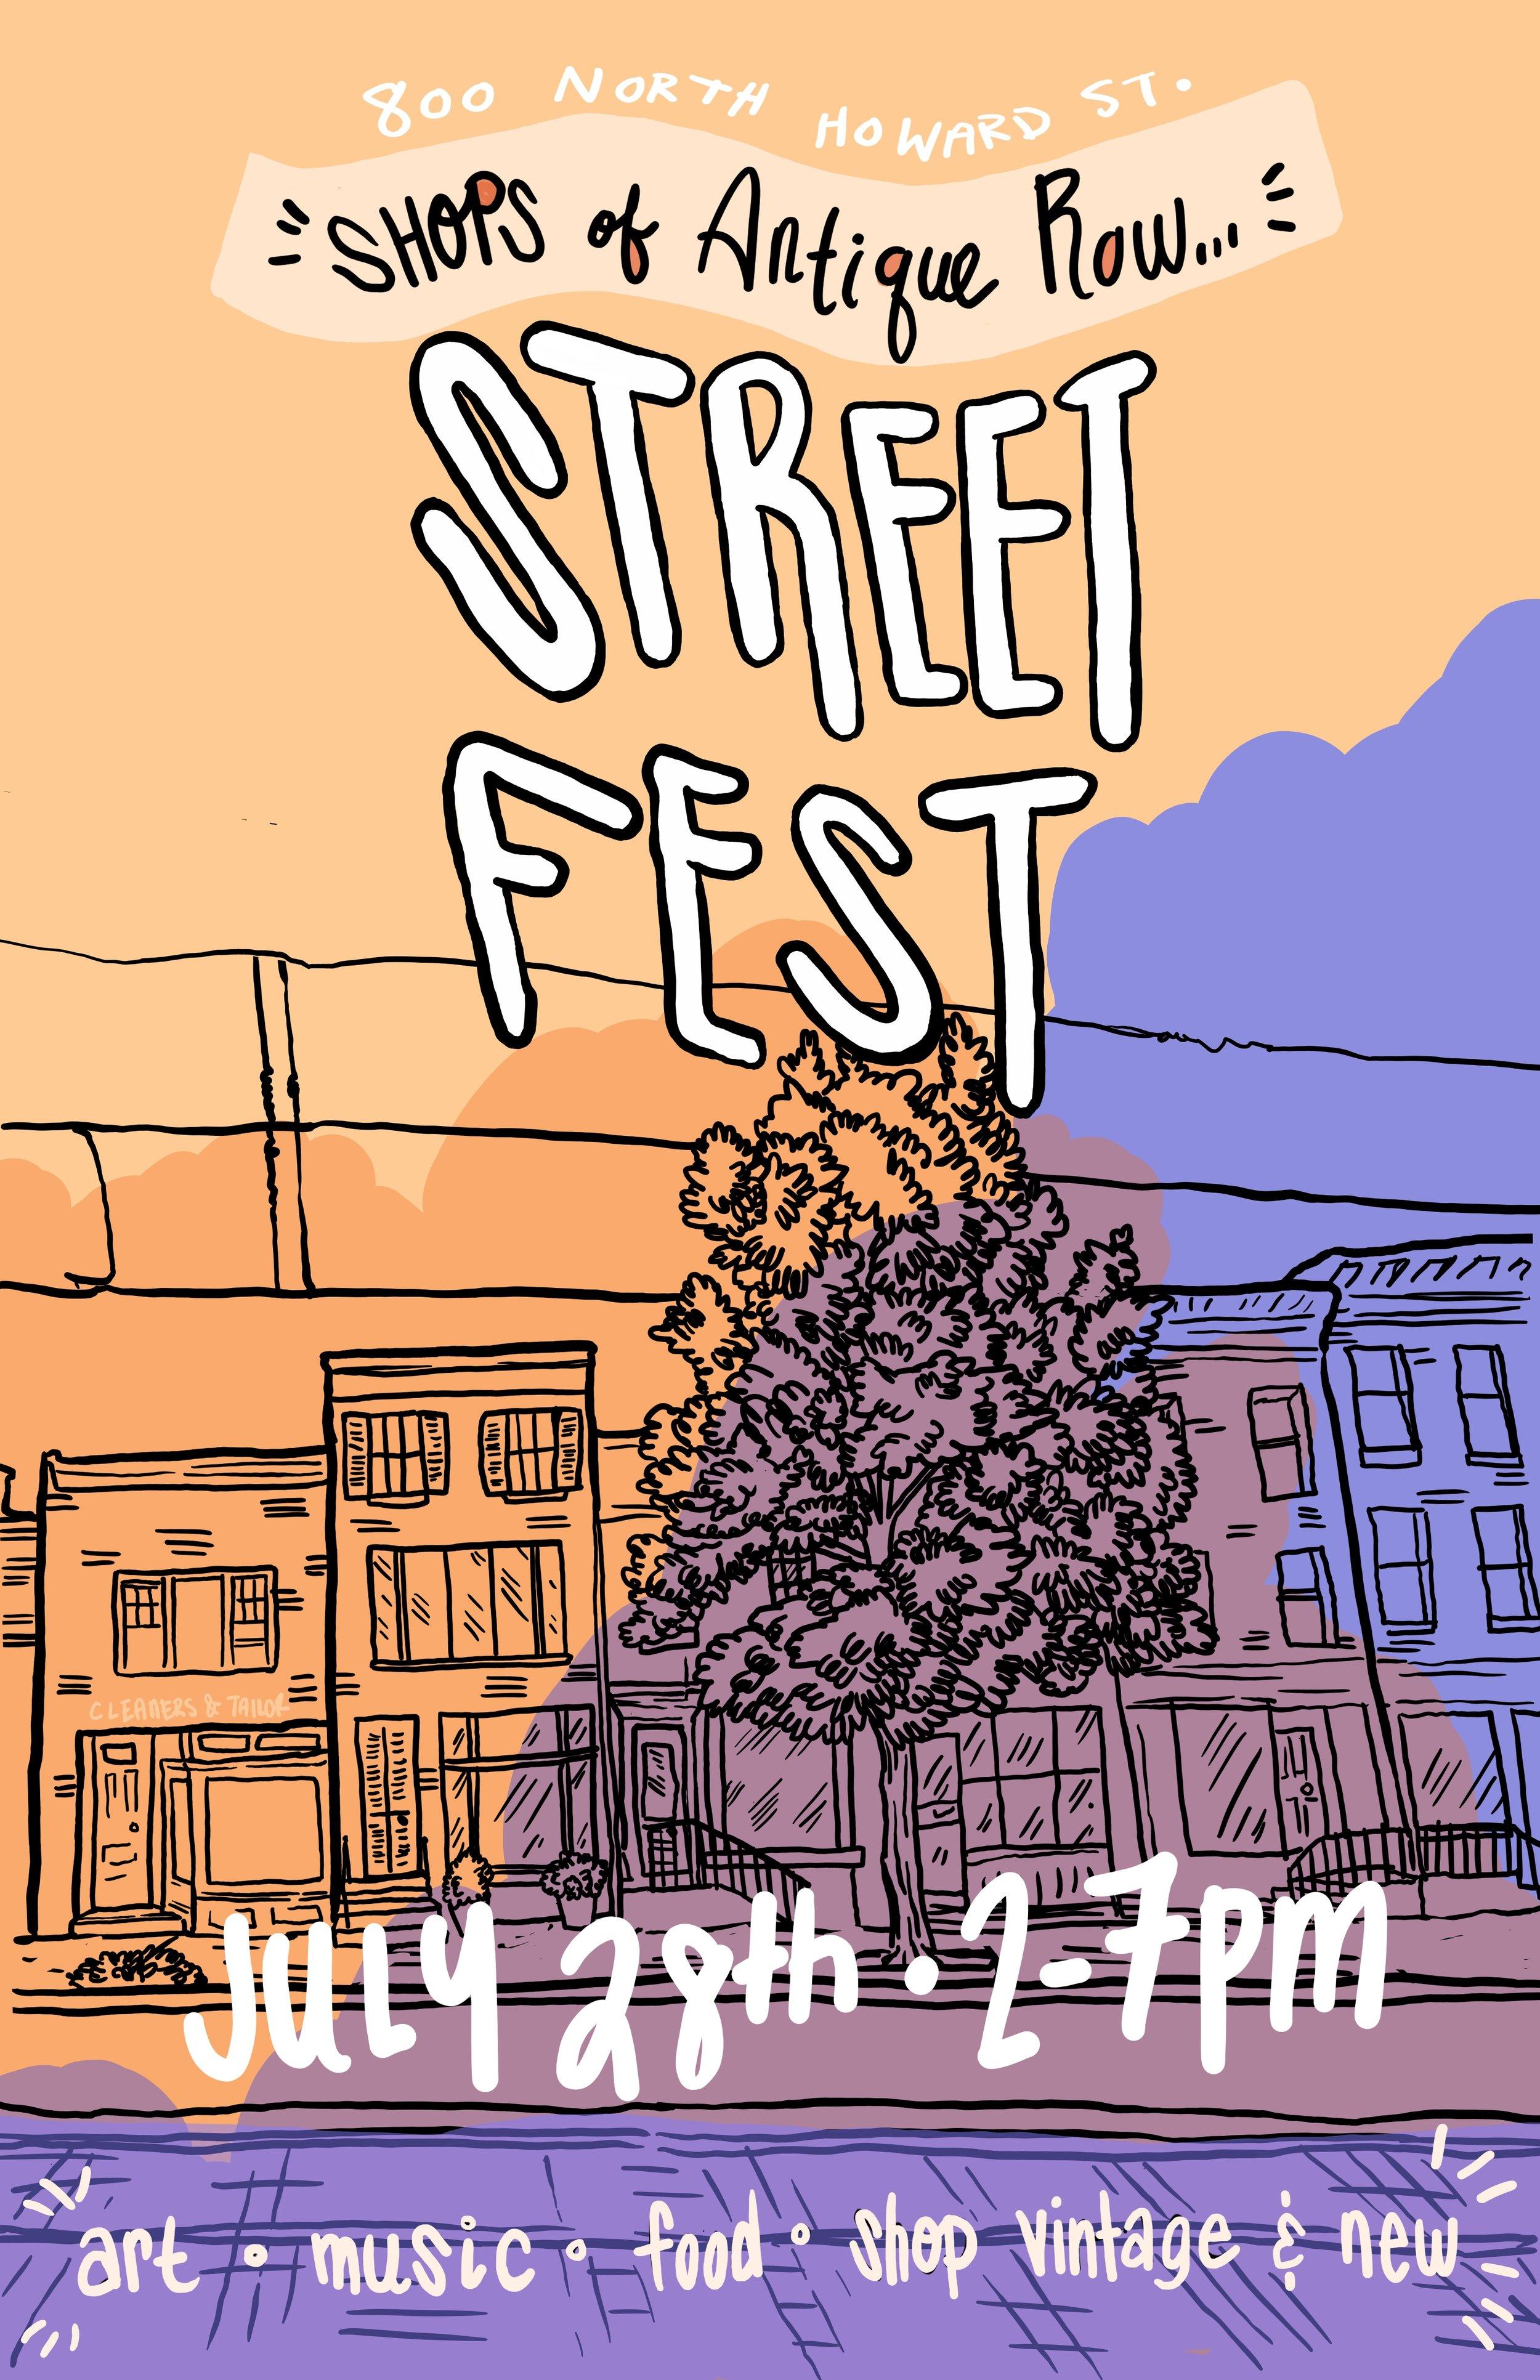 Antique Row Street Fest_11x17.jpg